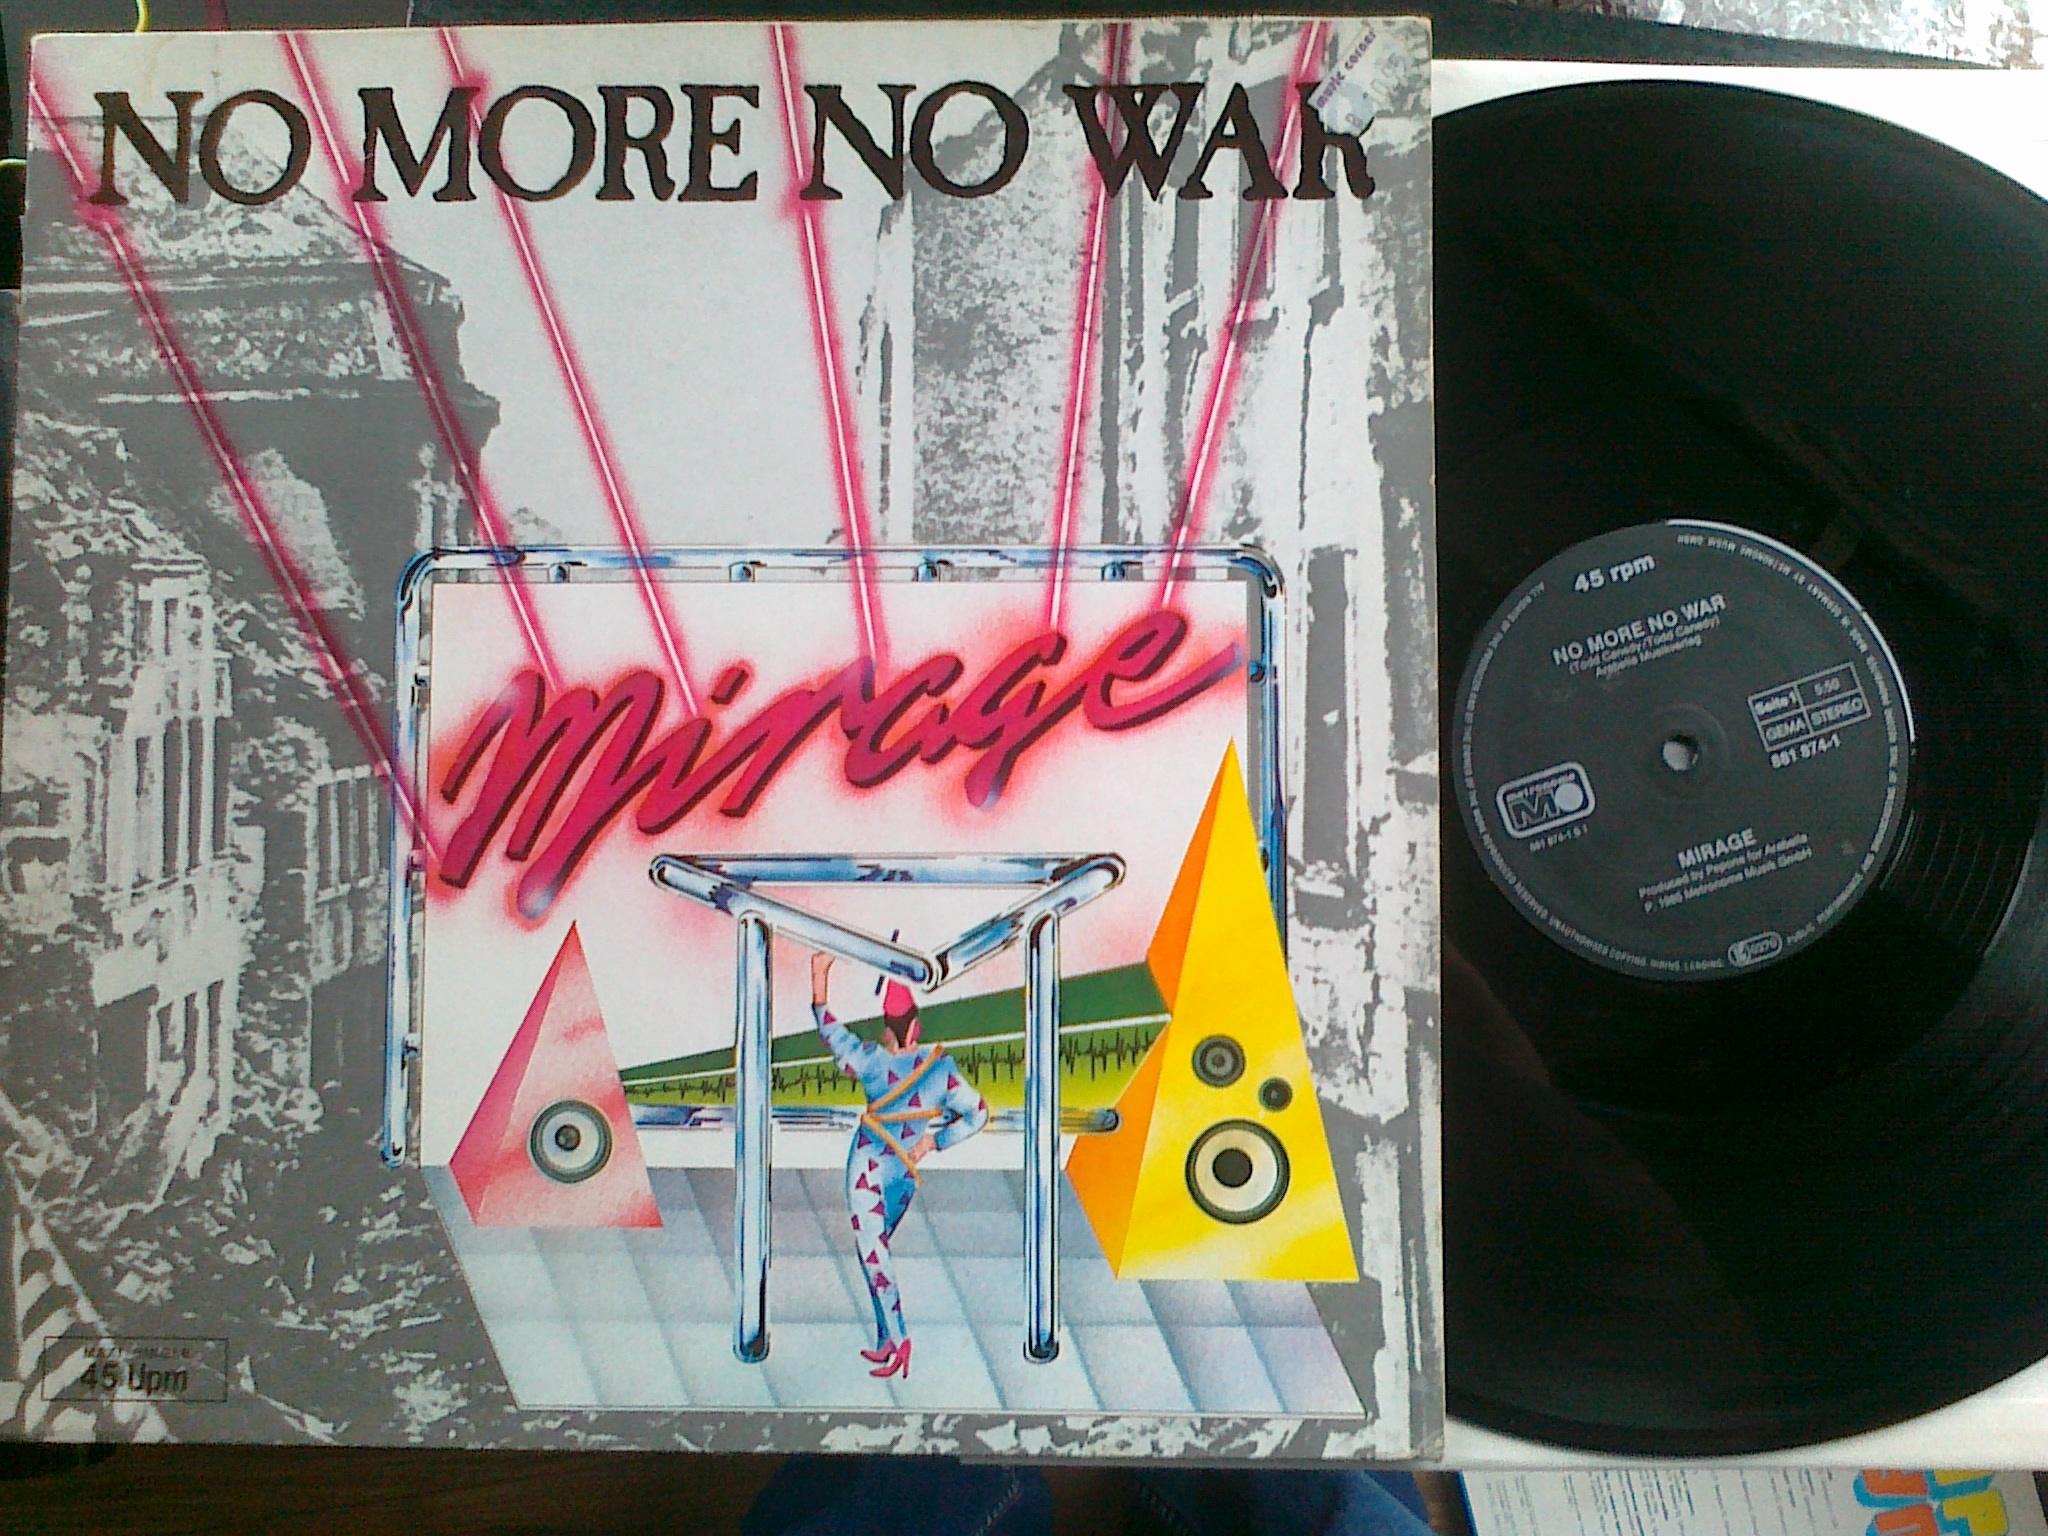 Mirage - No More No War